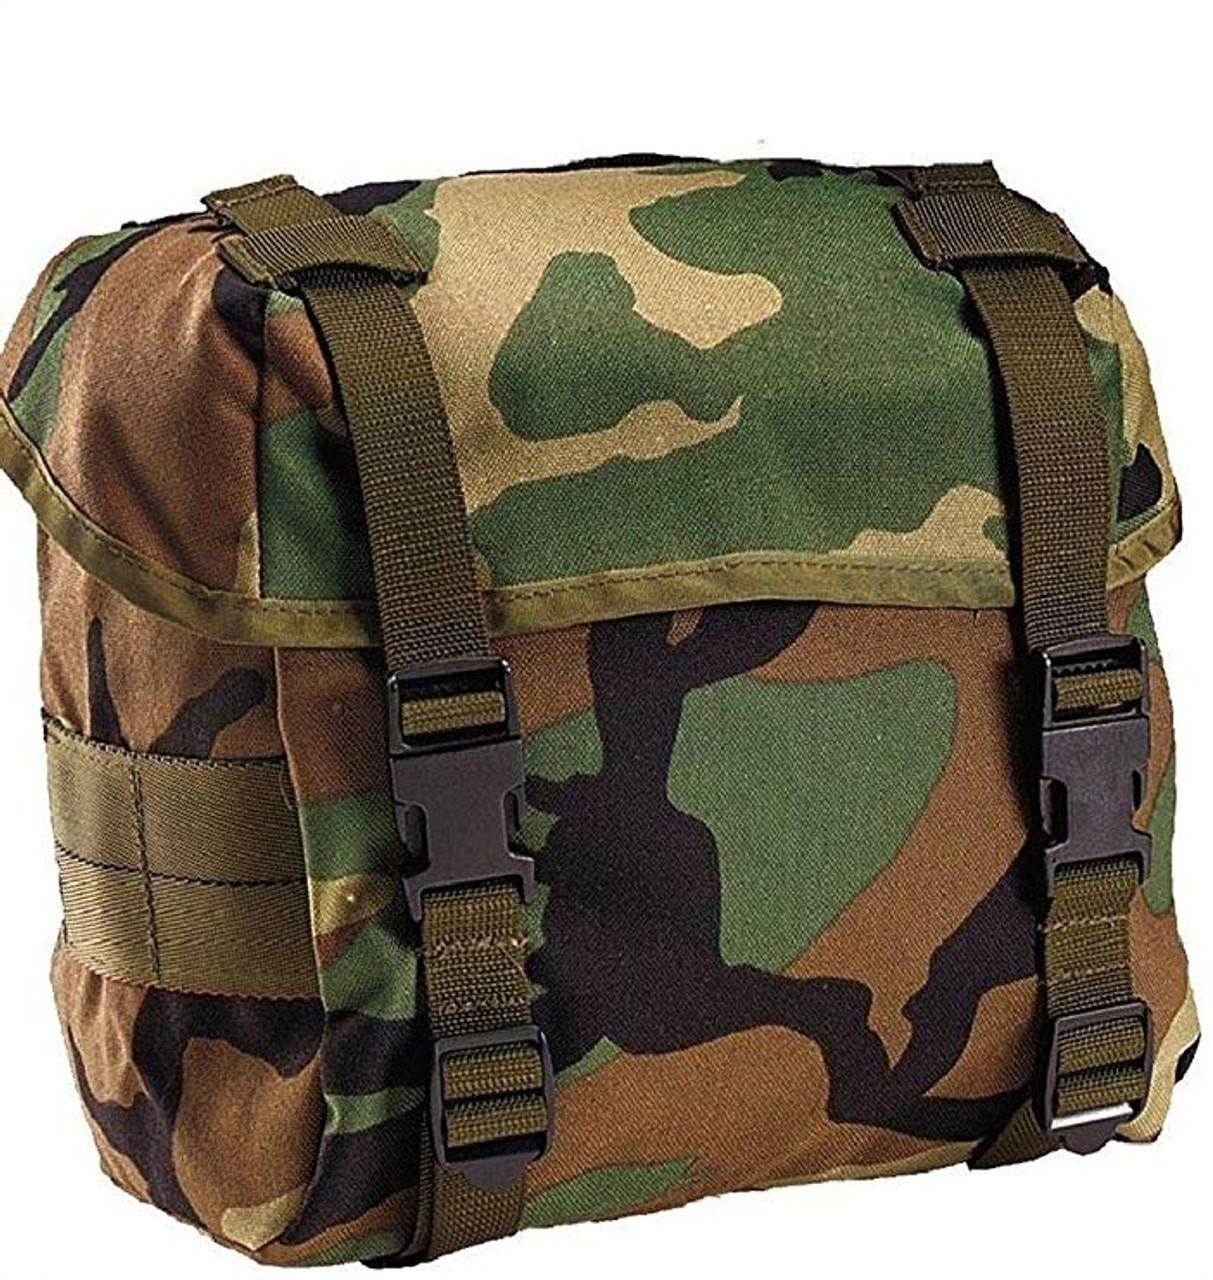 NEW USGI Woodland Cordura Butt Pack